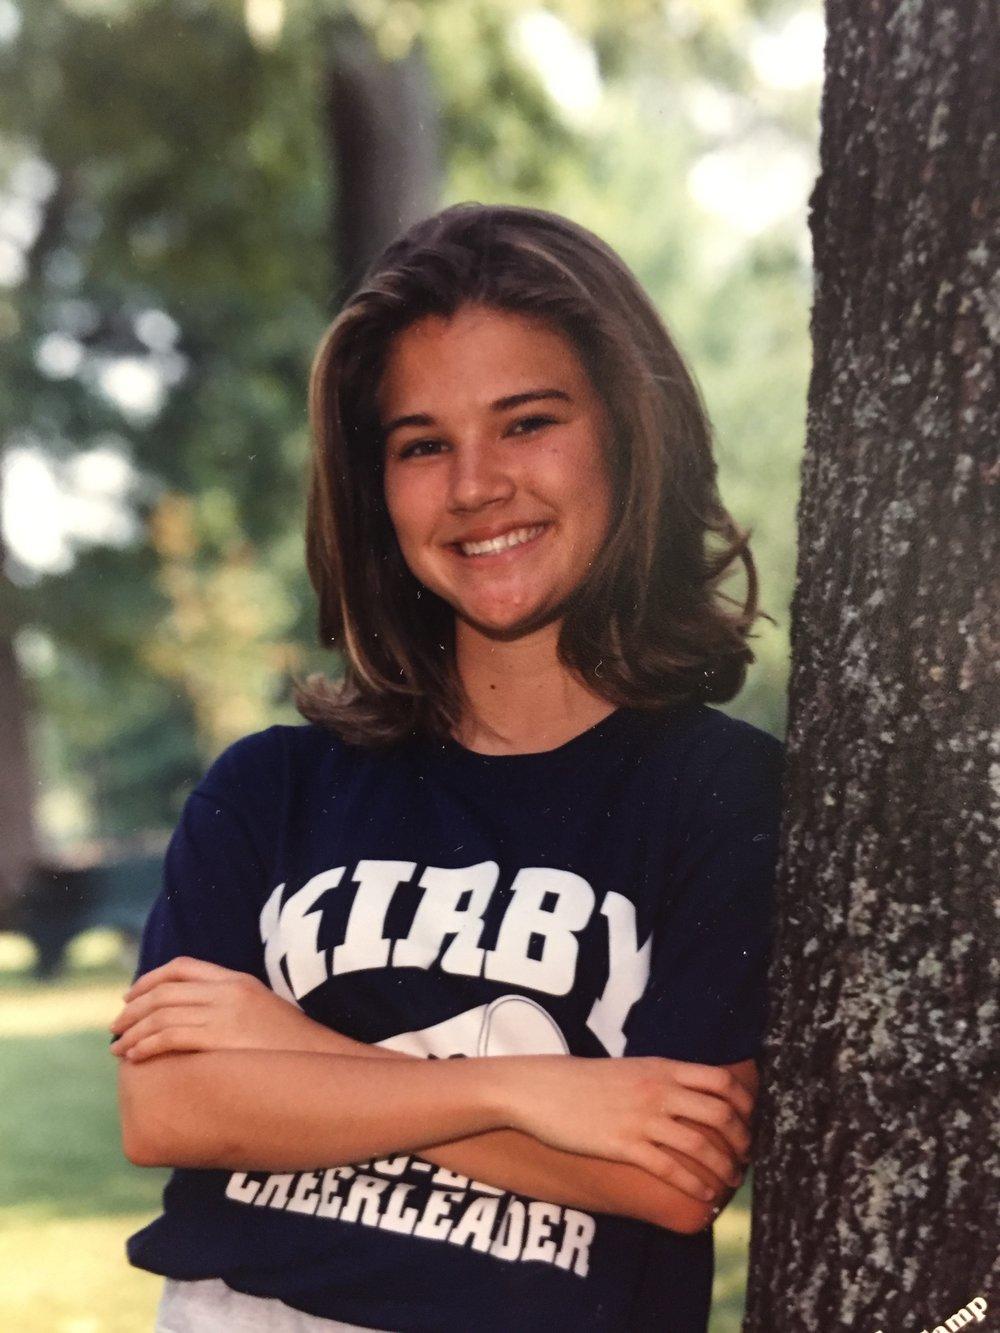 Ms. Baier's 9th Grade Photo